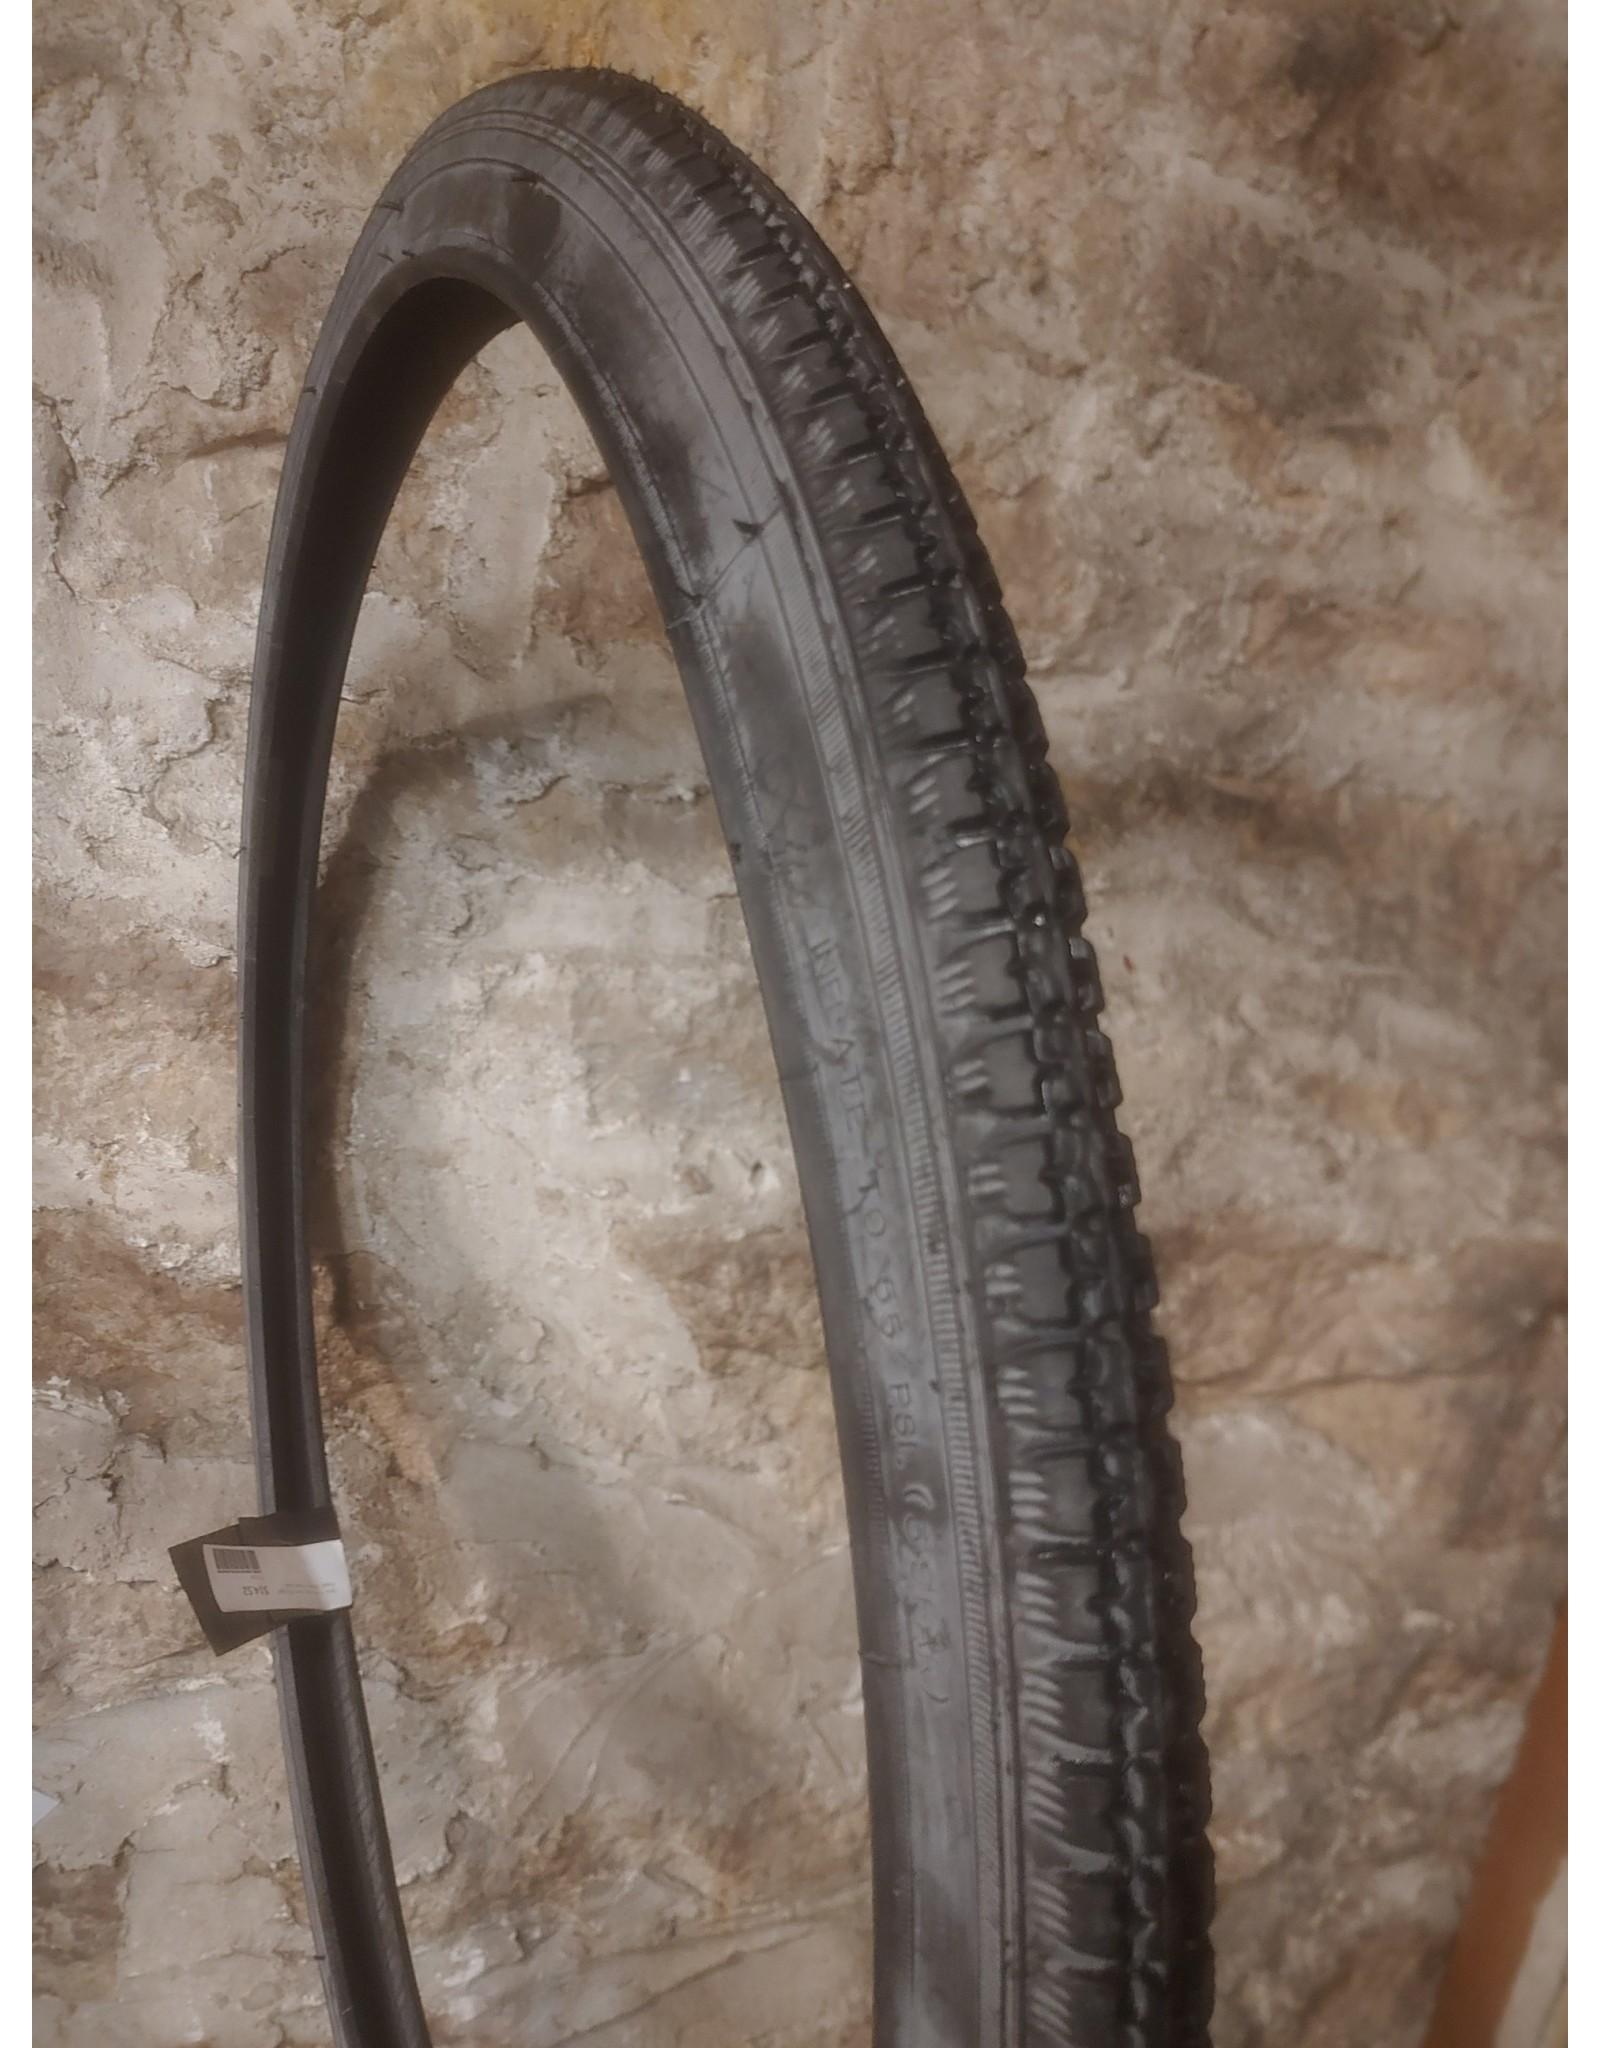 Tire - Duro, 584mm x 40mm, 650b, Basic Tread, Black